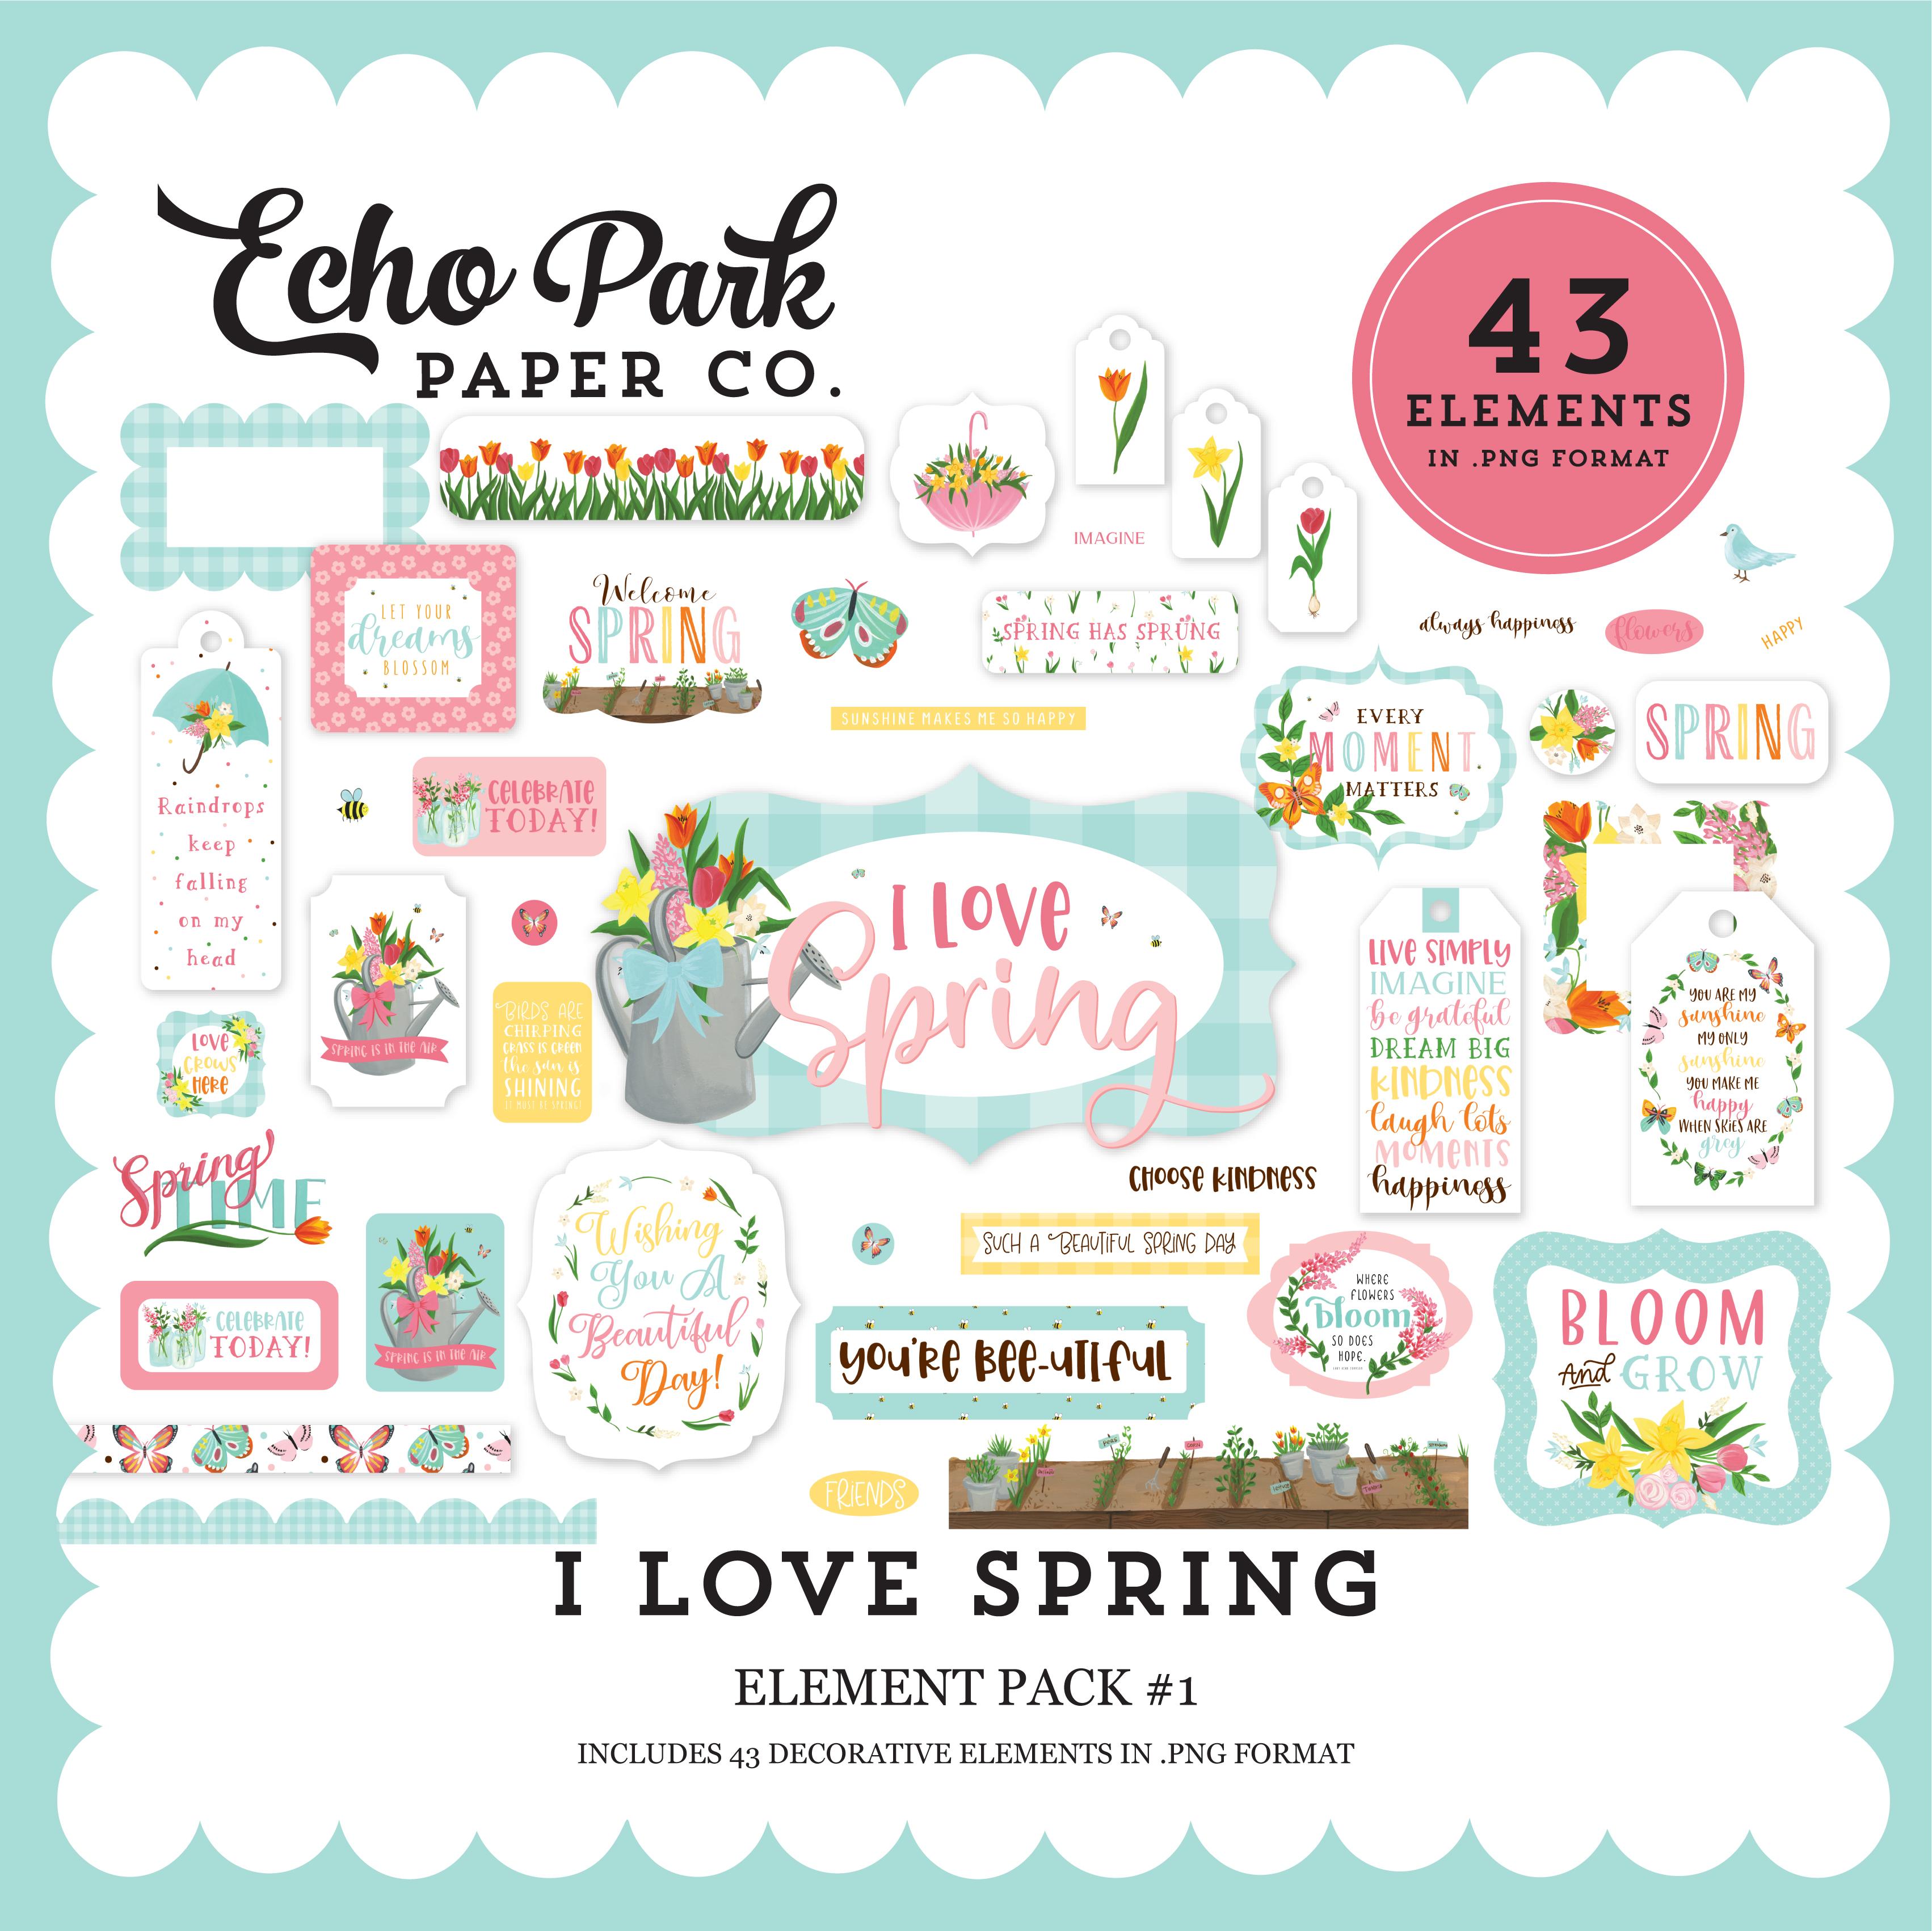 I Love Spring Element Pack #1